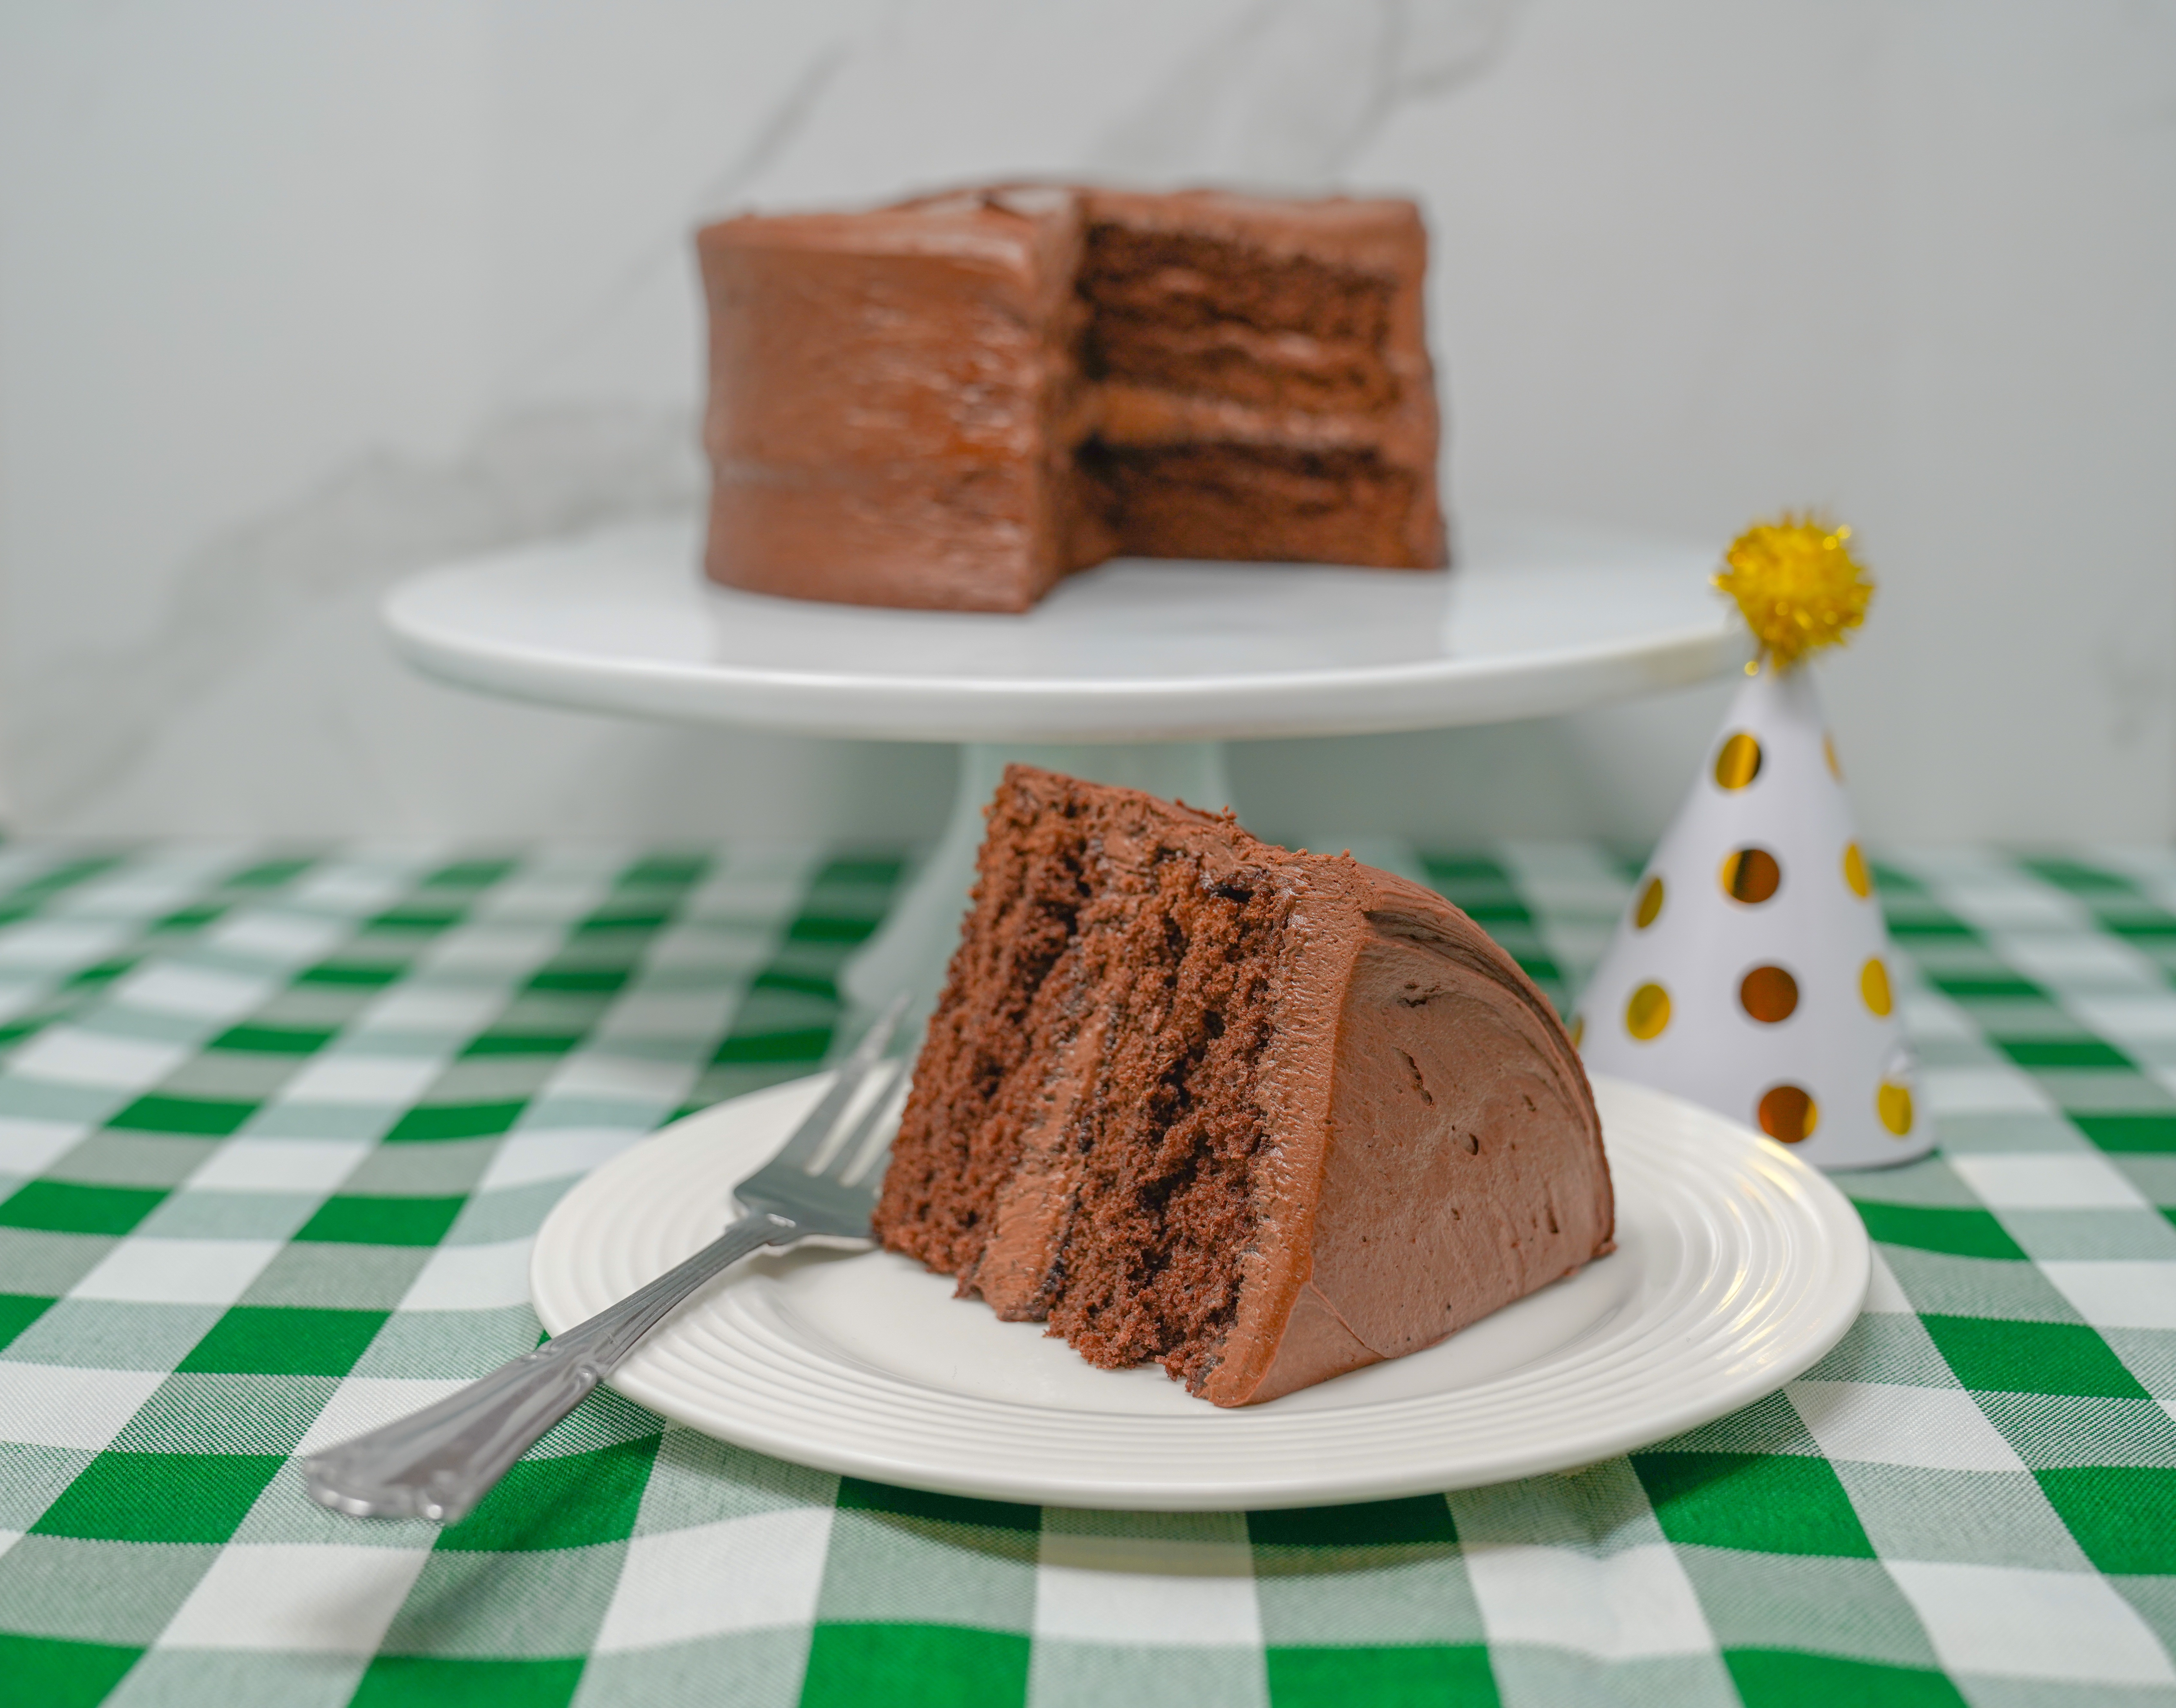 A slice of Bill Knapp's chocolate cake